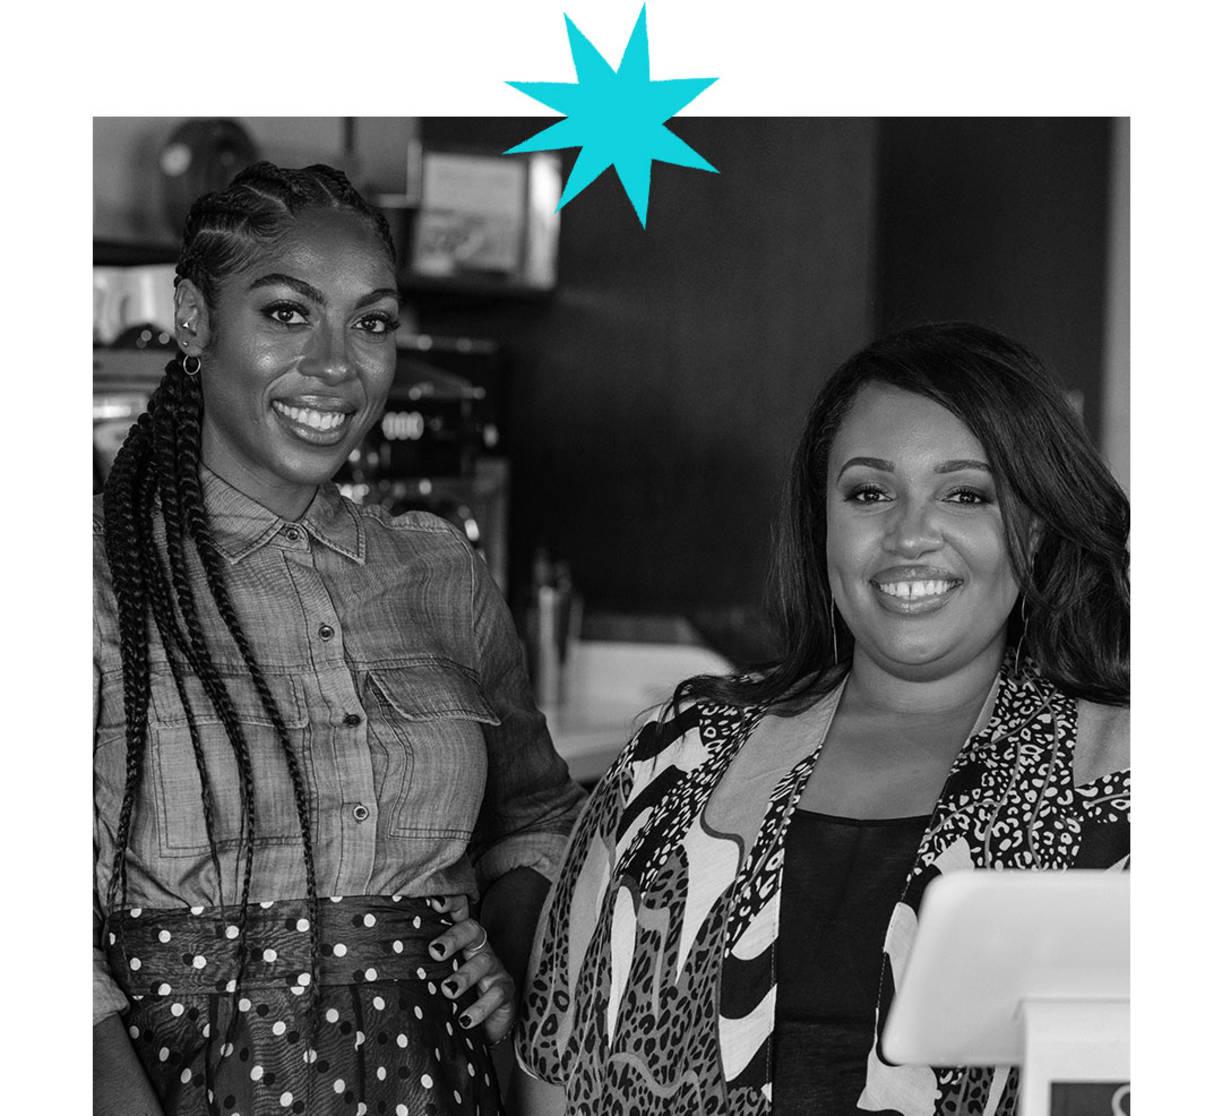 Amanda-Jane Thomas, left, and Shanita Nicholas are the co-founders of coffee house Sip & Sonder. (LaDonn Williams)